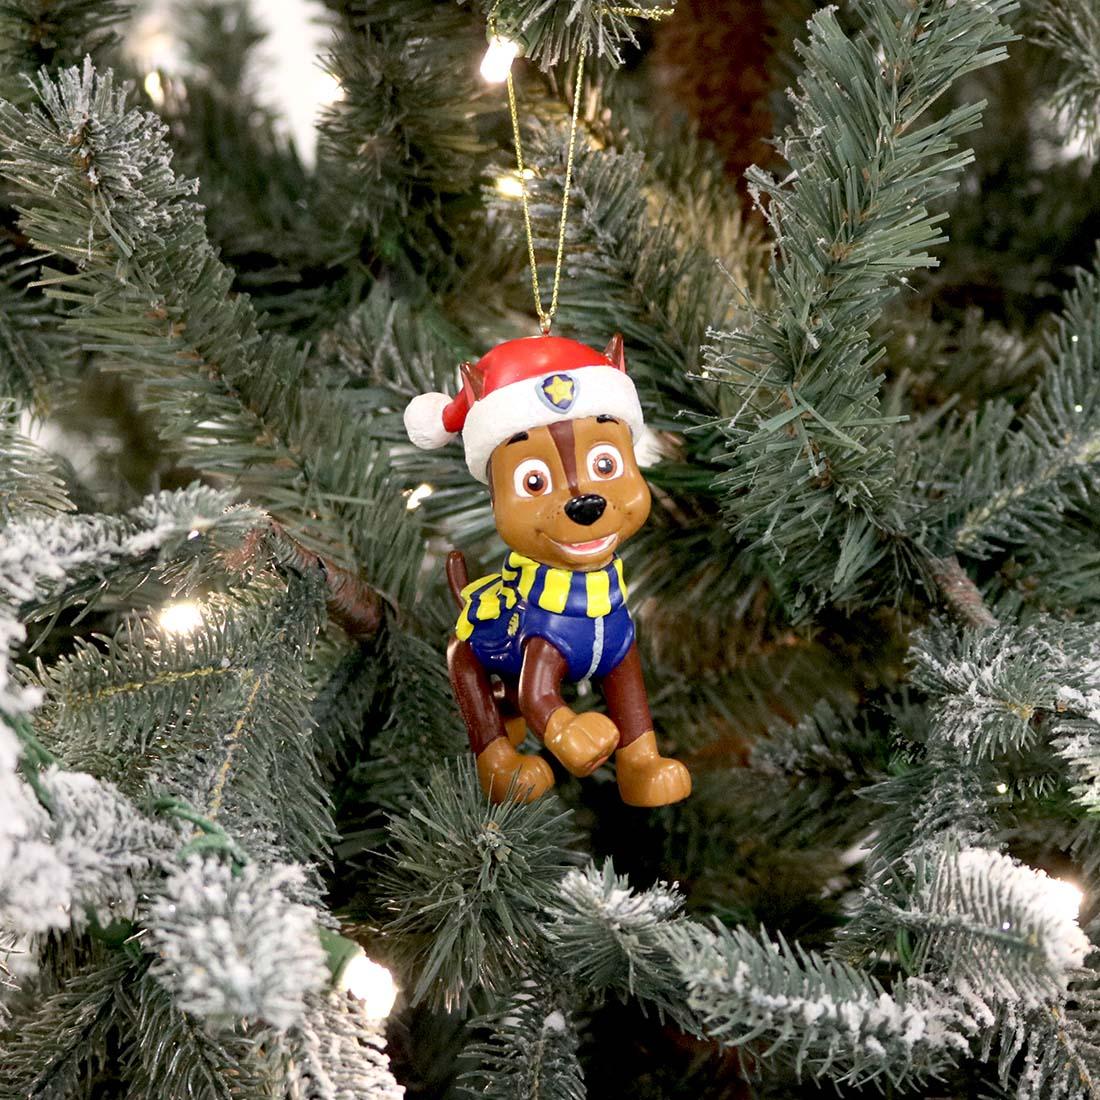 Christmas Ornaments Cracker Barrel Christmas Ornament Ornament Gold Ornaments